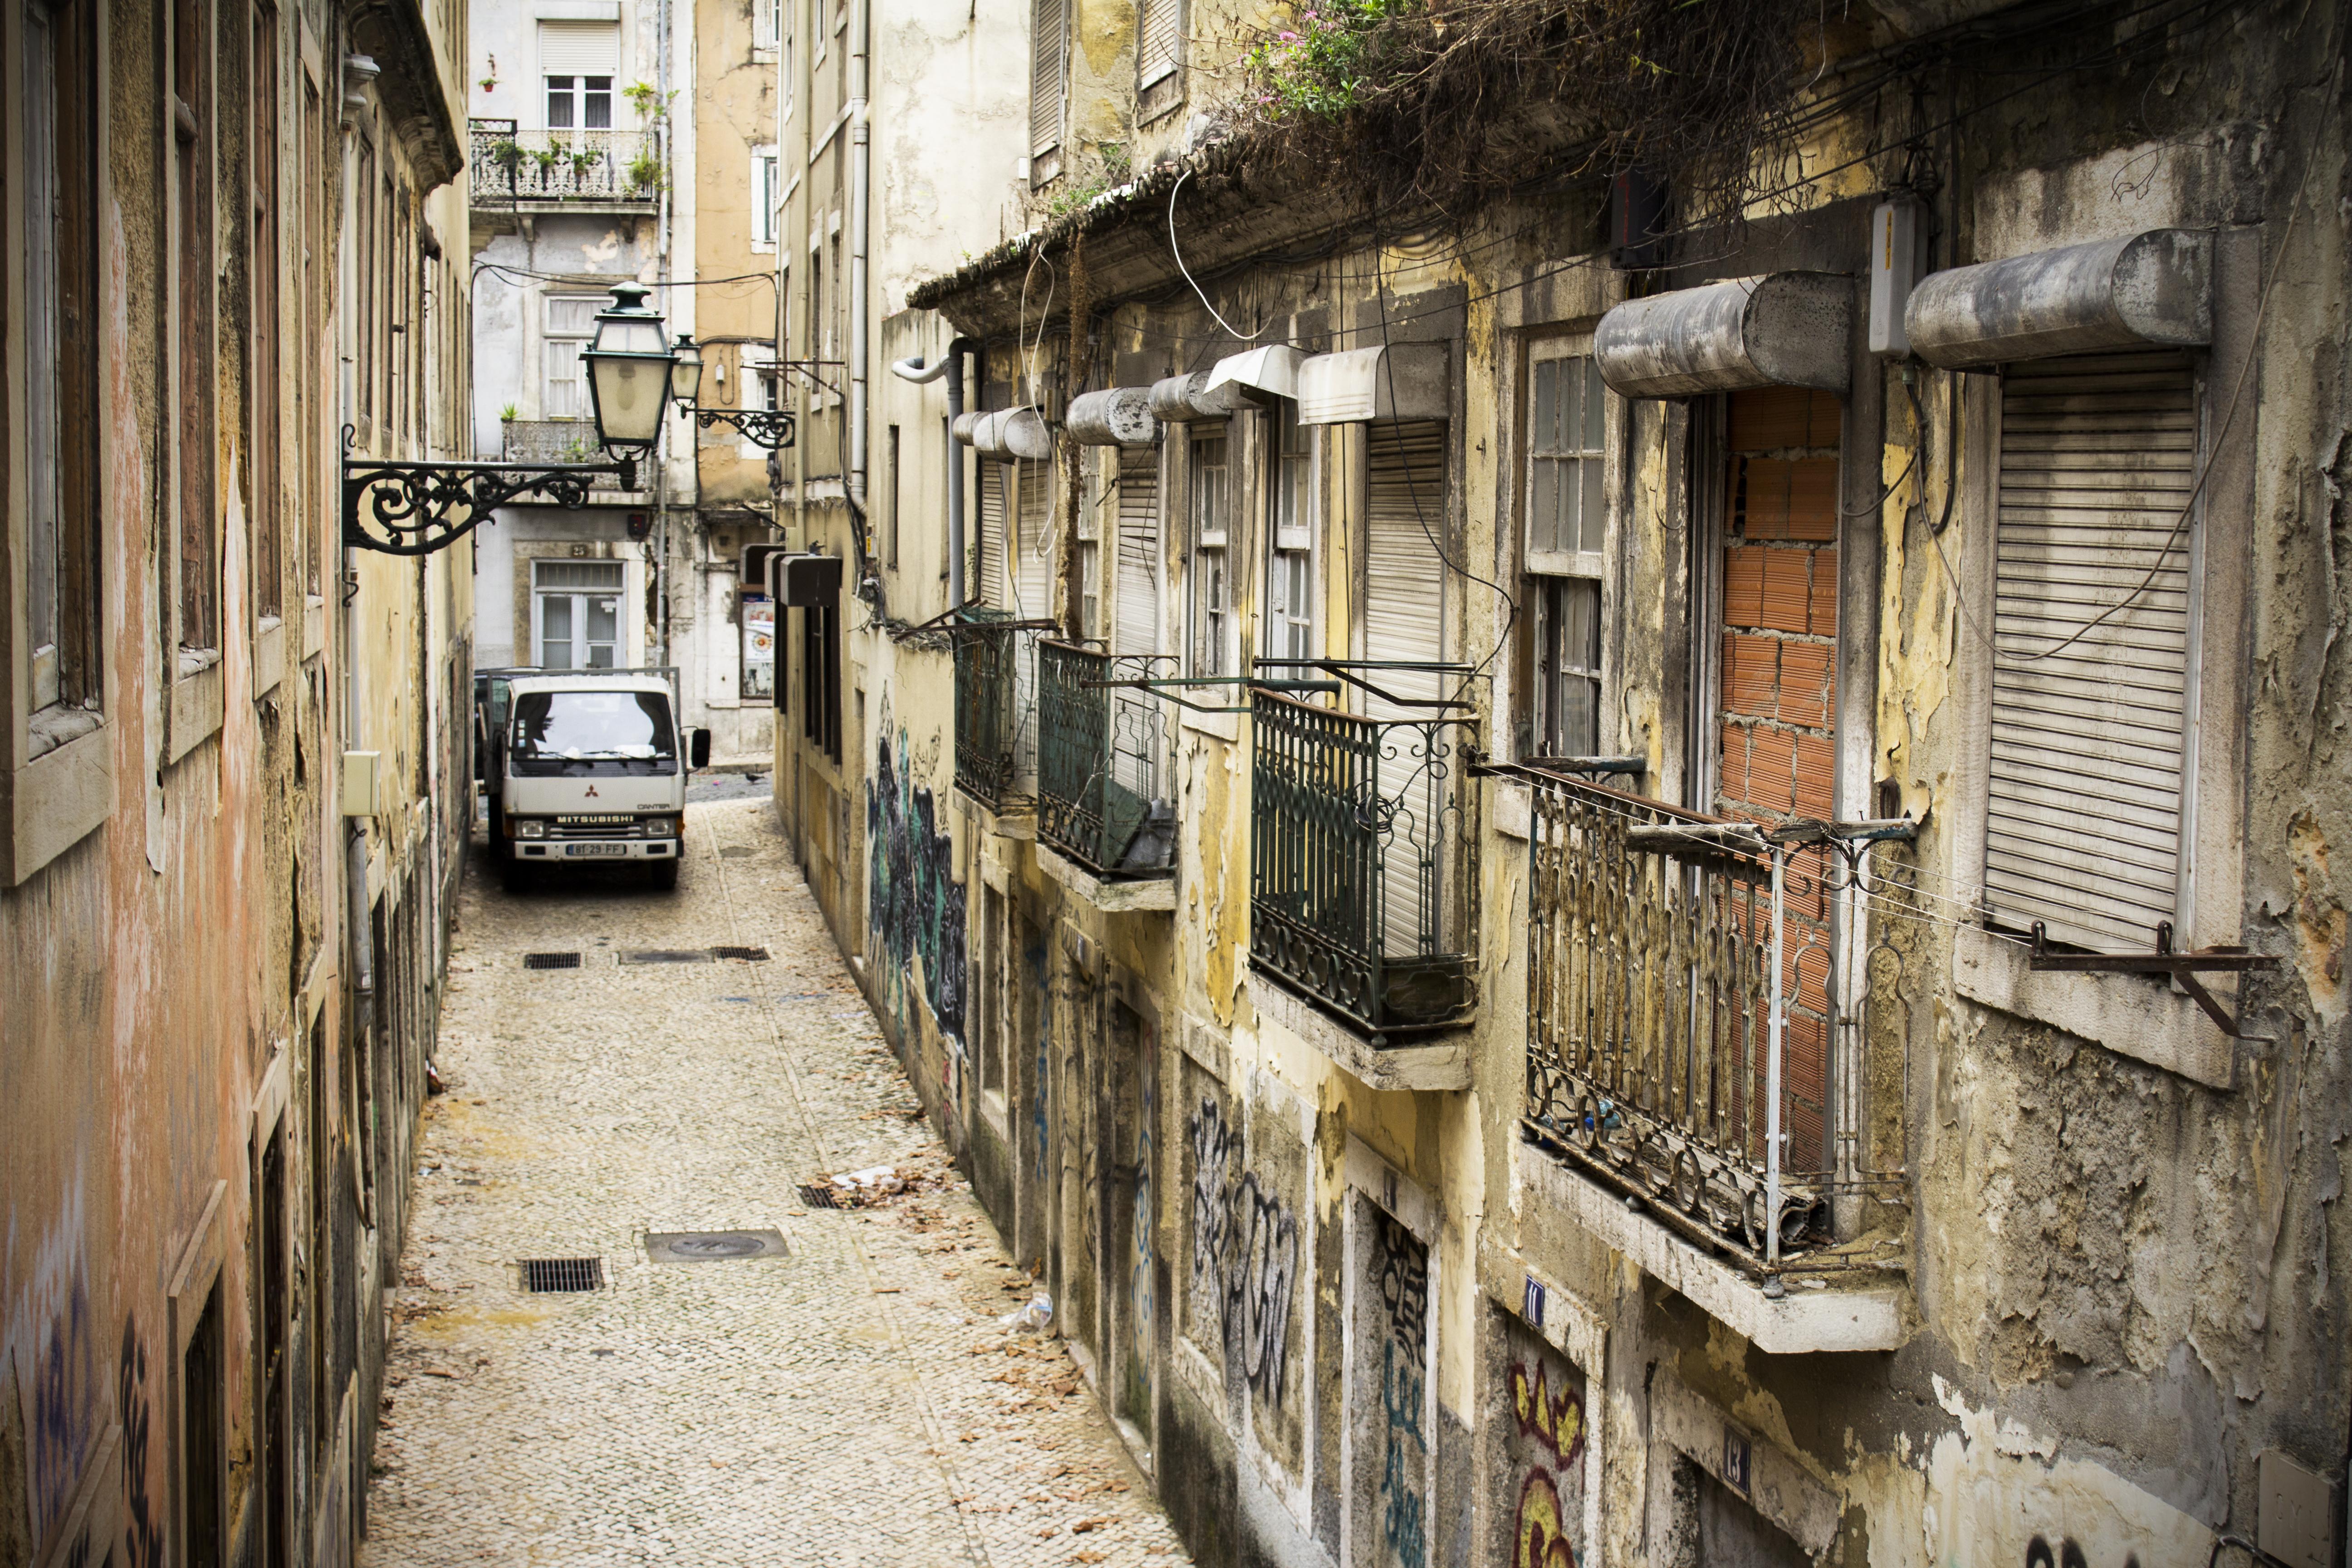 Narrow street in Lisbon by JoseSantos94 on DeviantArt